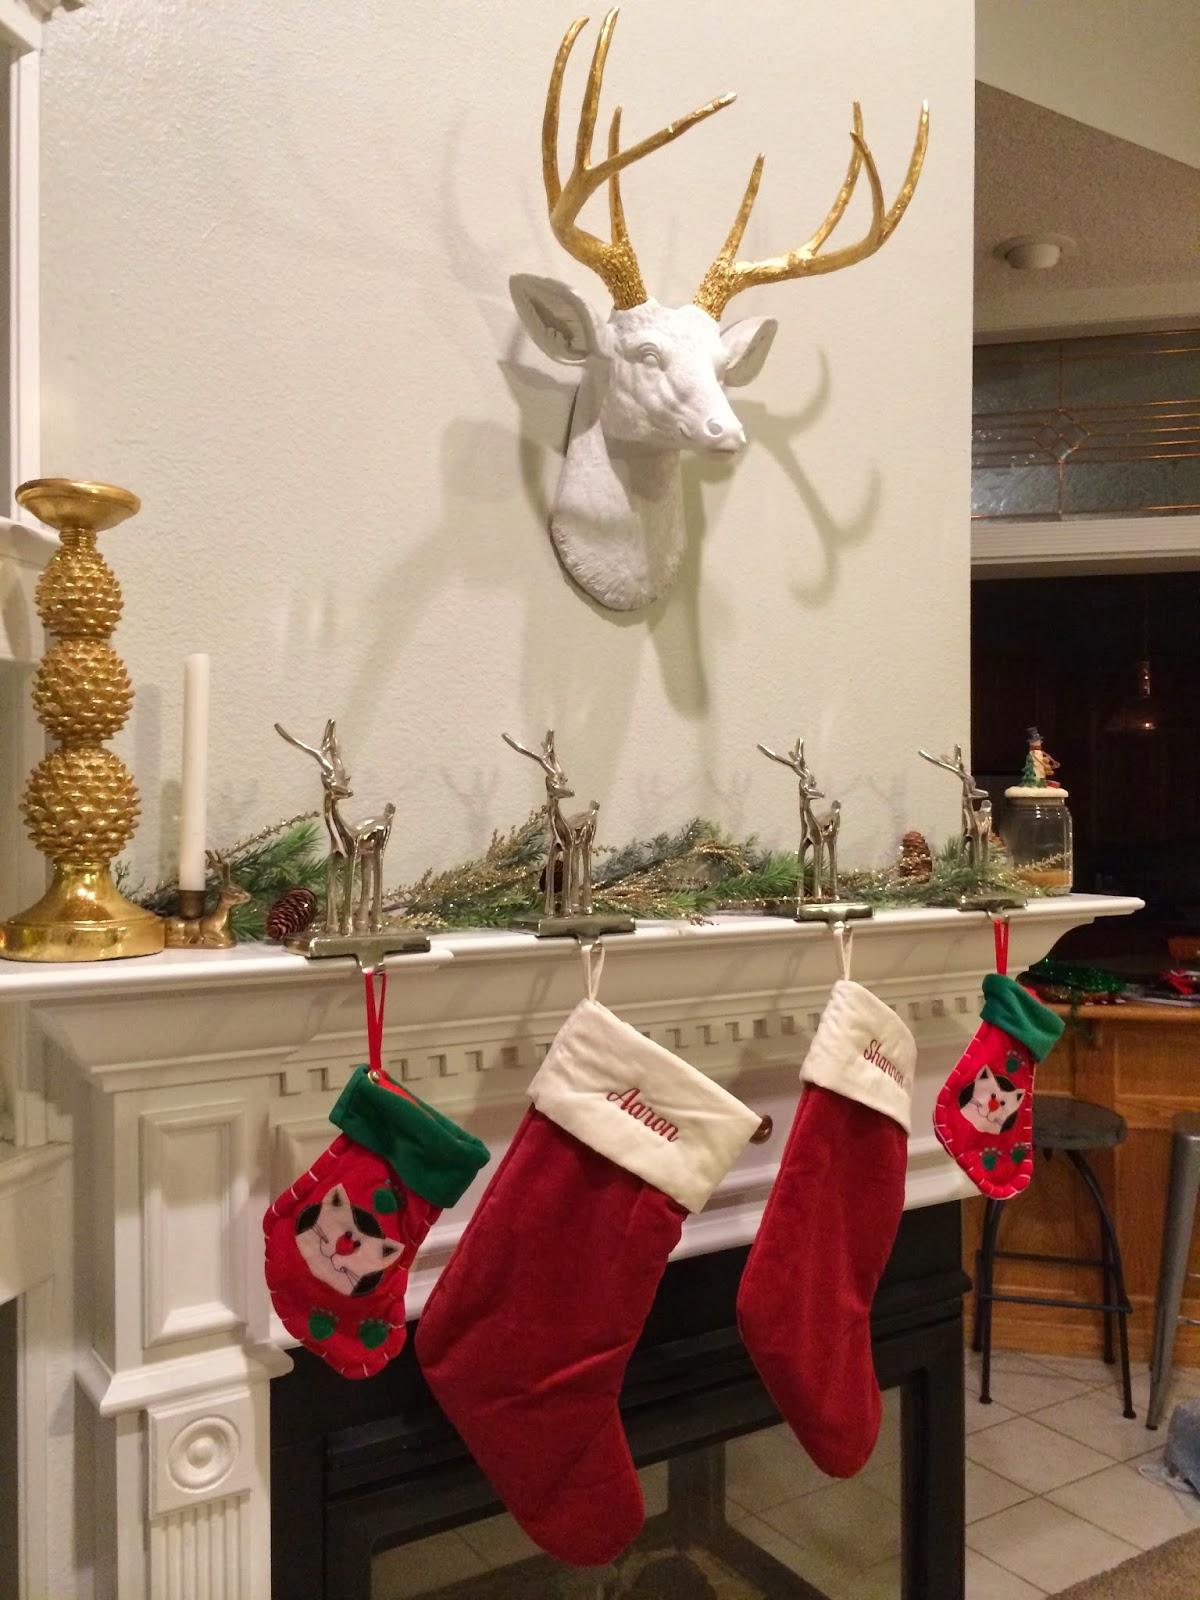 christmas rugs pottery drapes artistry barn pillows barns stockings kids most desk white wonderful